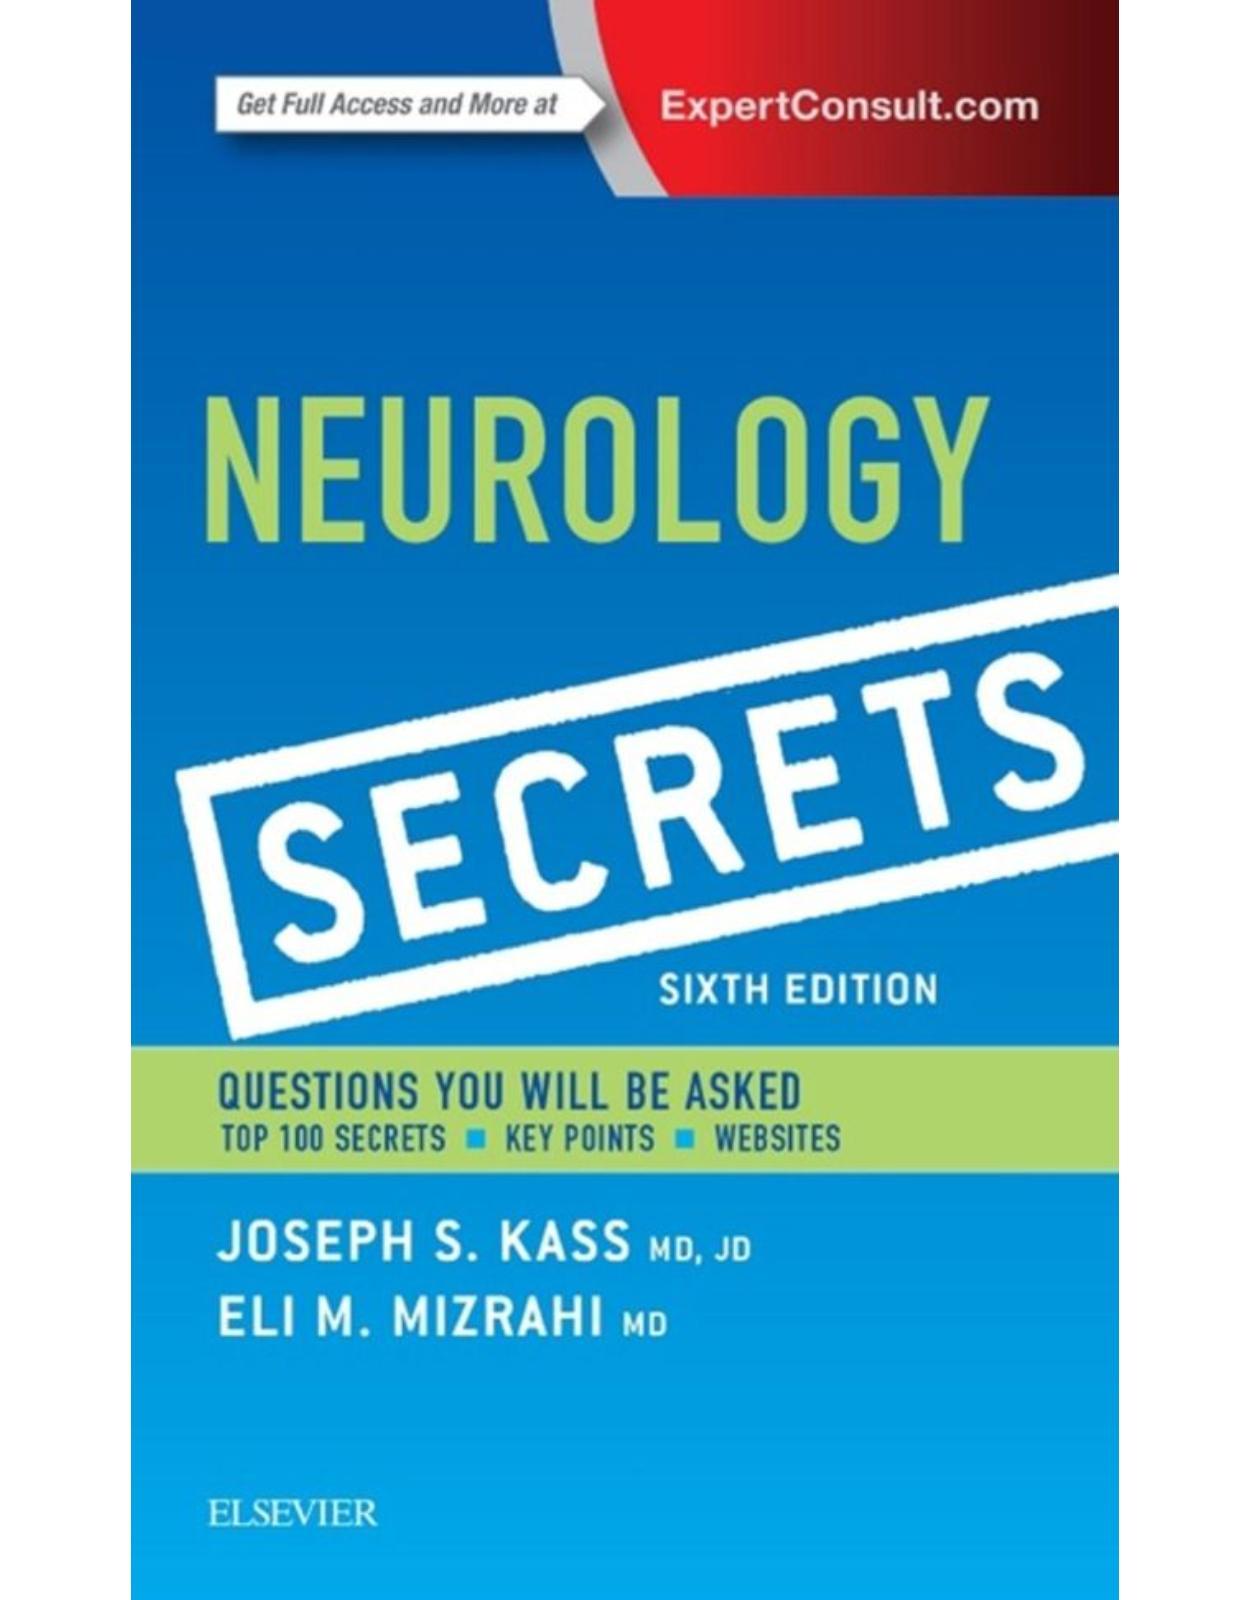 Neurology Secrets, 6th Edition